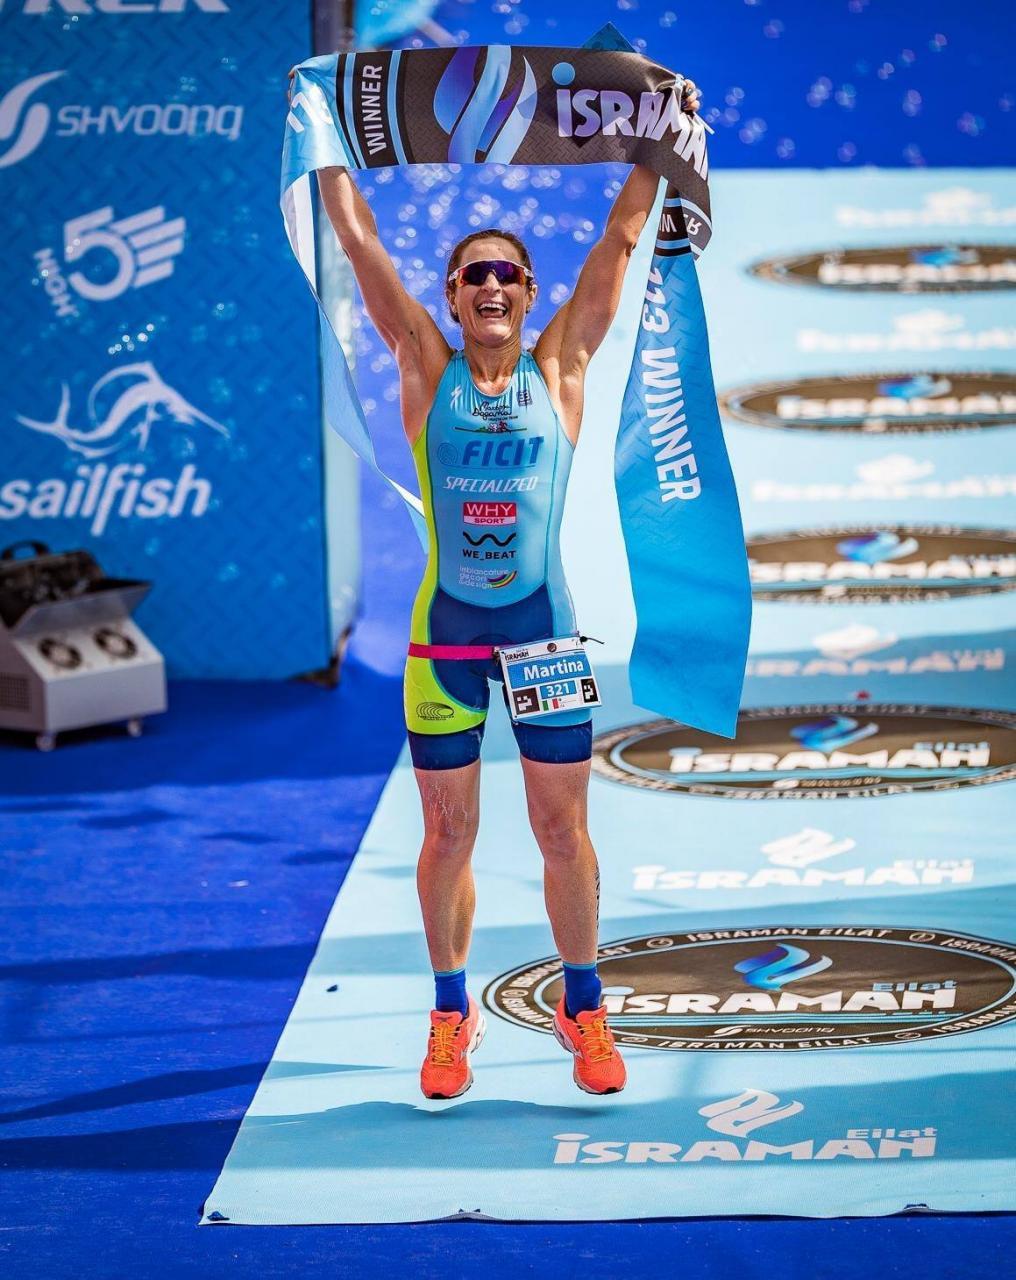 Martina-Dogana - Imola Triathlon